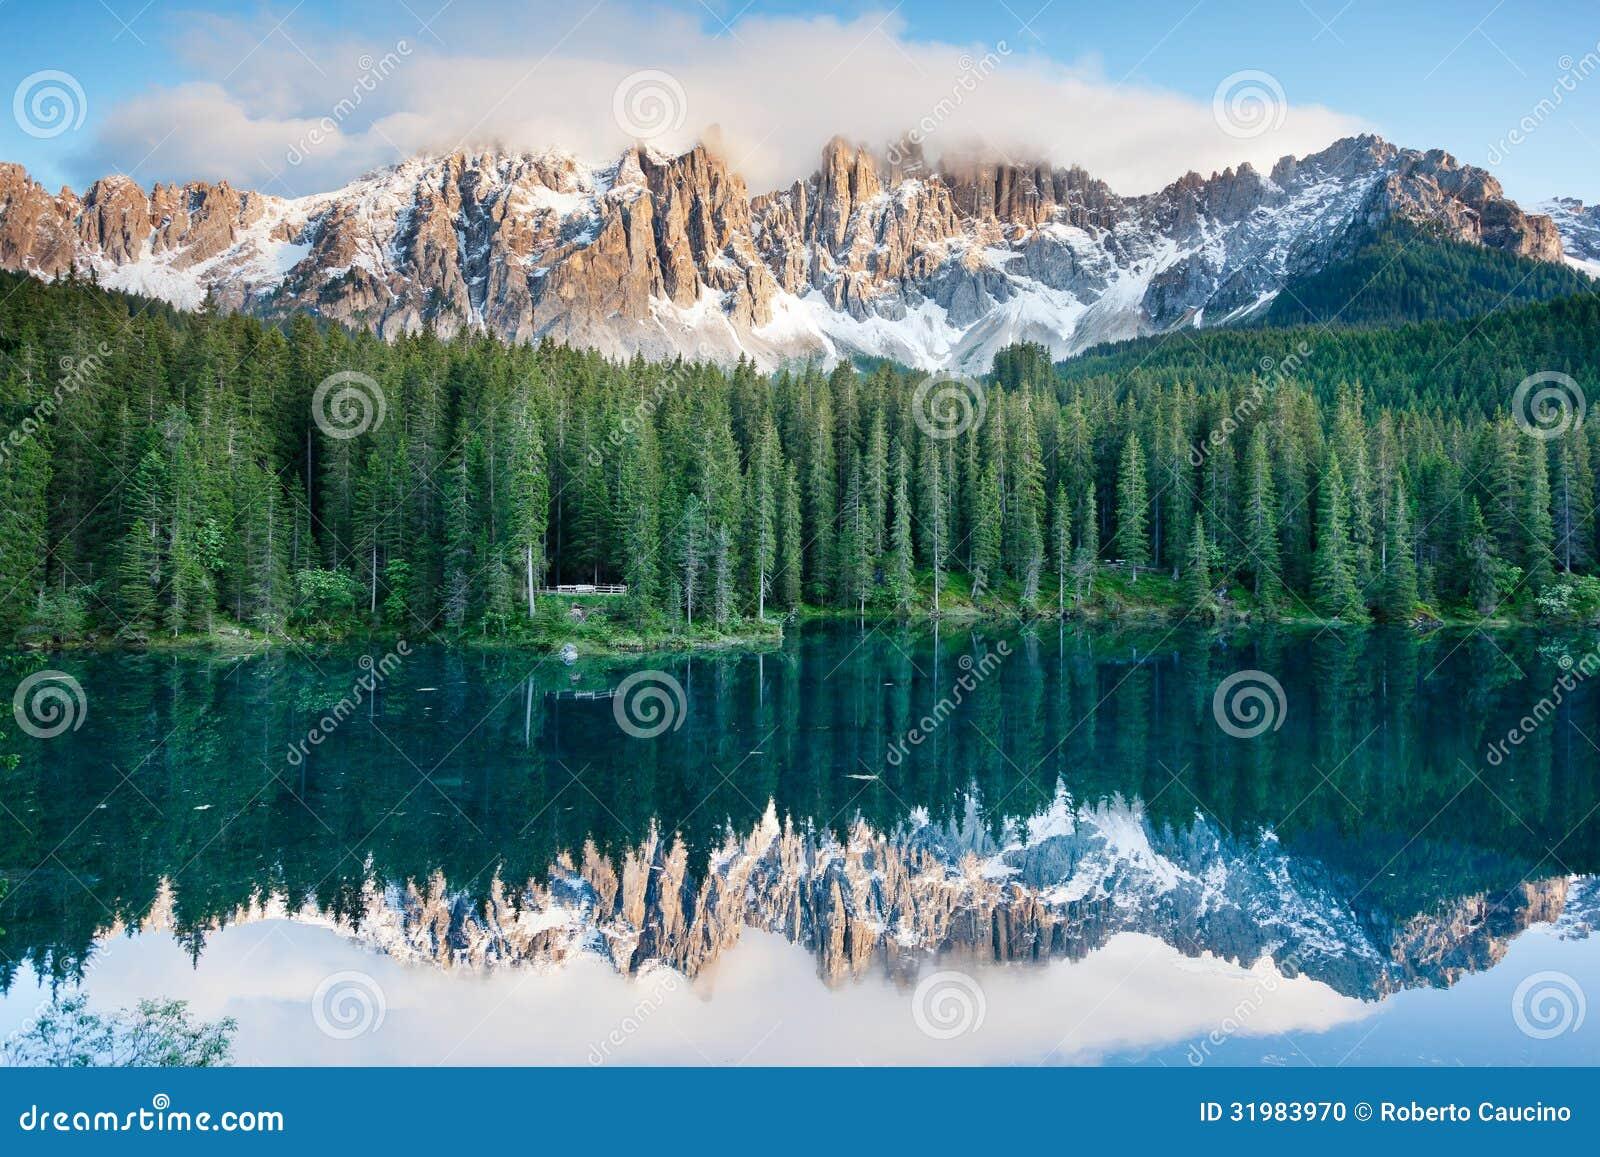 Karersee, meer in het Dolomiet in Zuid-Tirol, Italië.